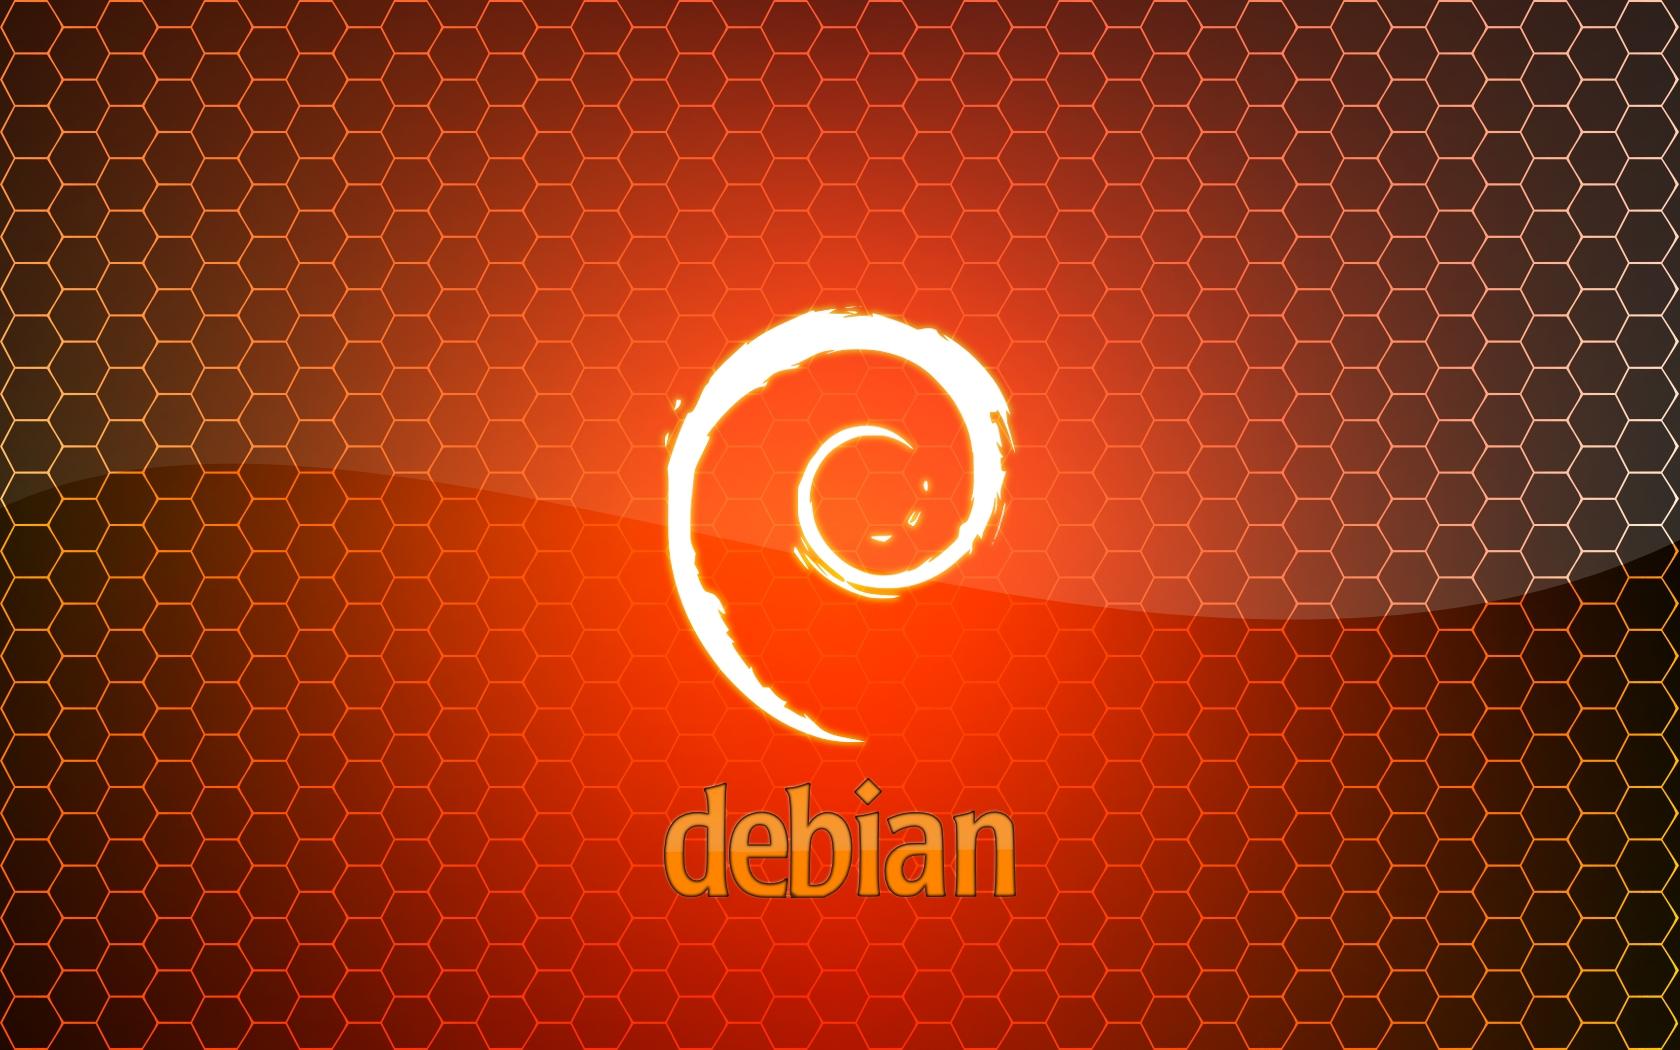 Debian Squeeze Wallpapers - Tux-planet